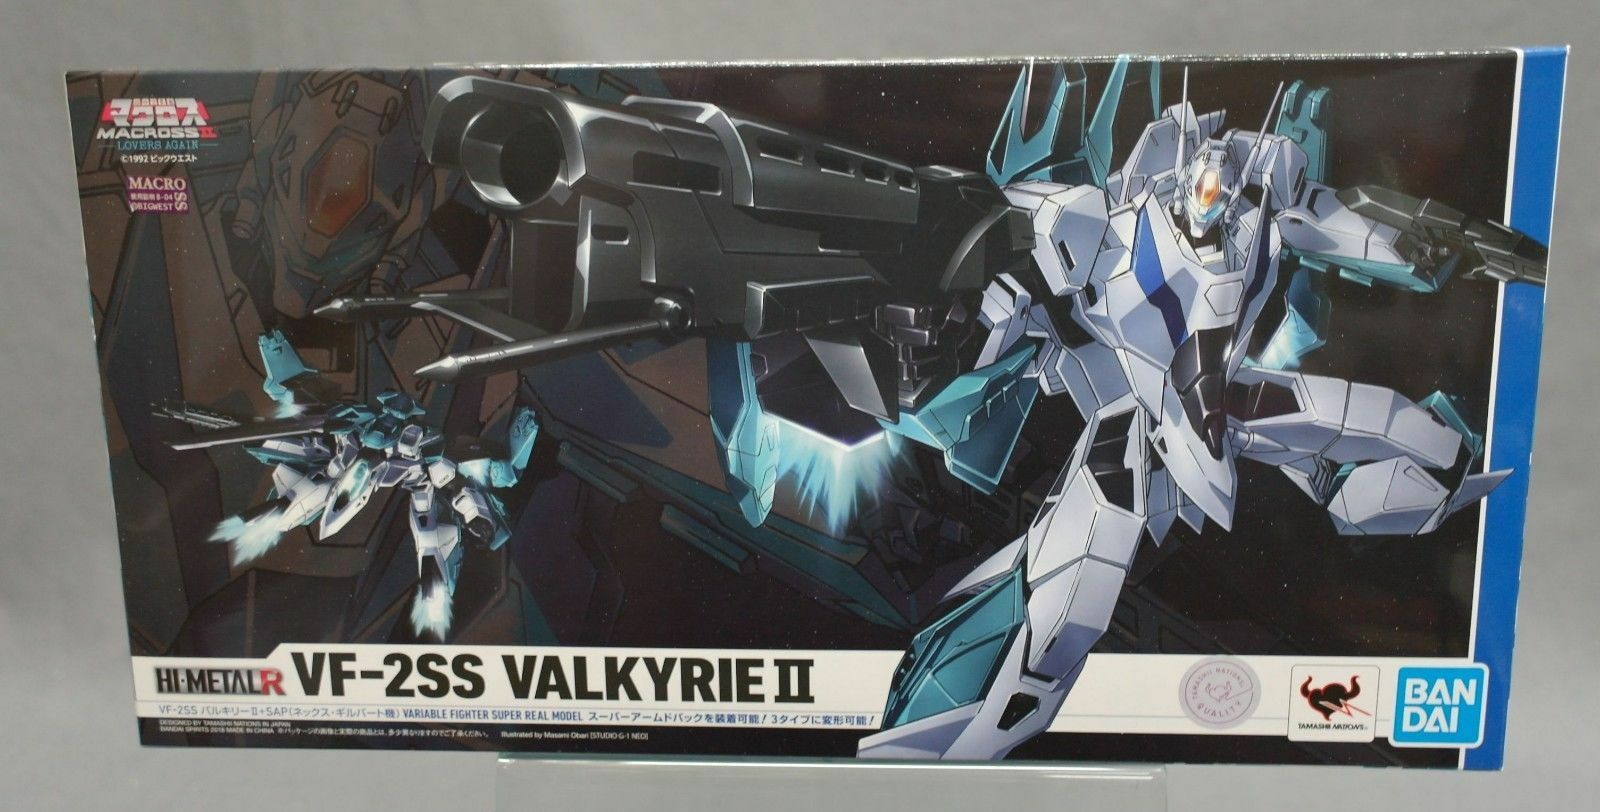 HI-METAL R VF-2SS Valkyrie II+SAP Nexx Gilbert Custom Macross II Lovers Again JP